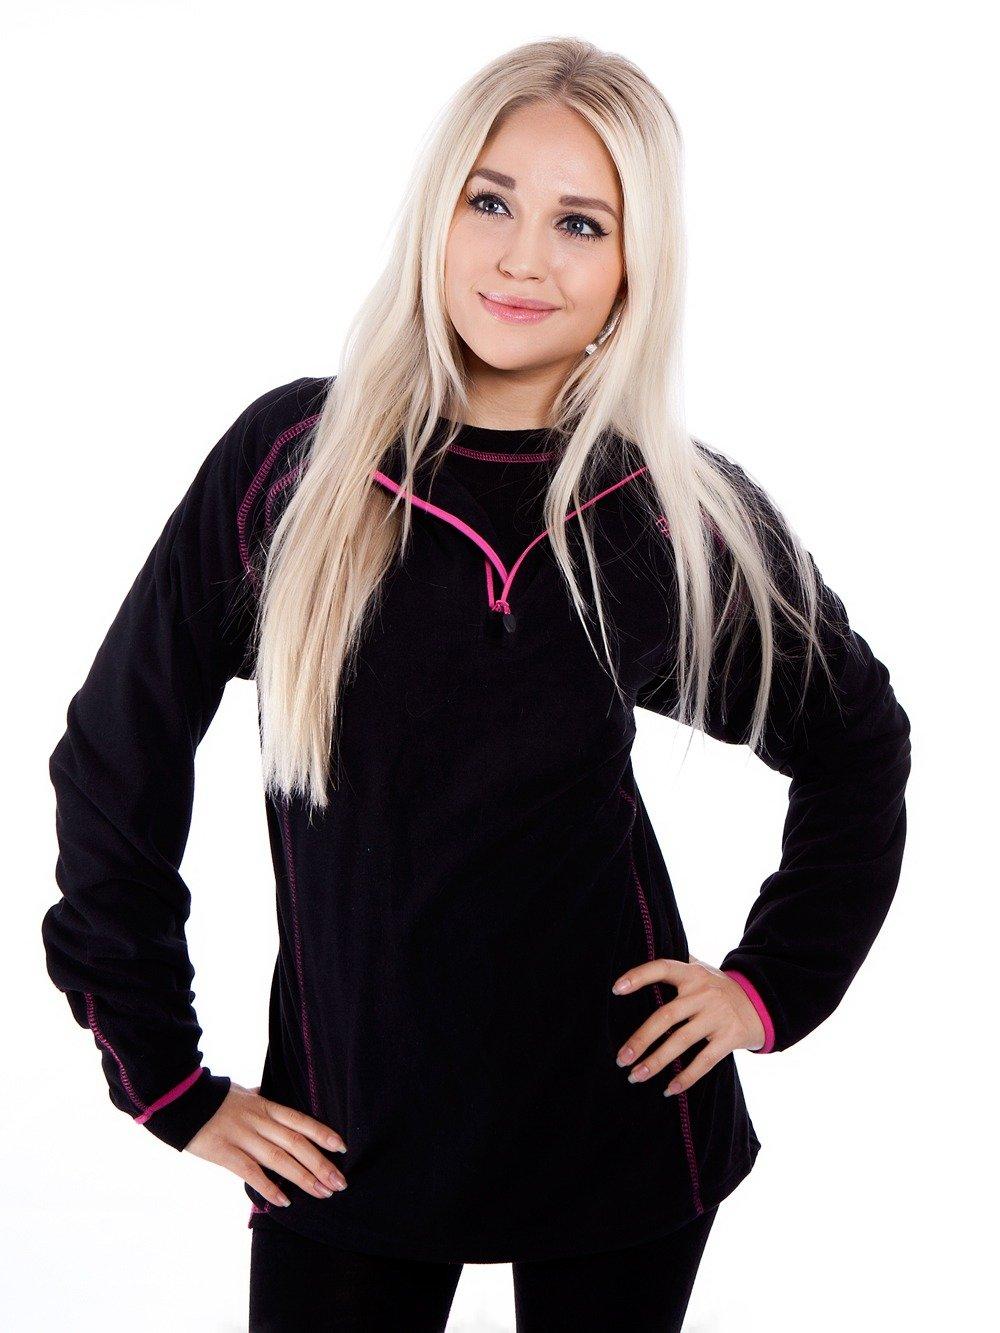 Typhoon – Typhoon st. moritz fleece trøje dame fra billigsport24